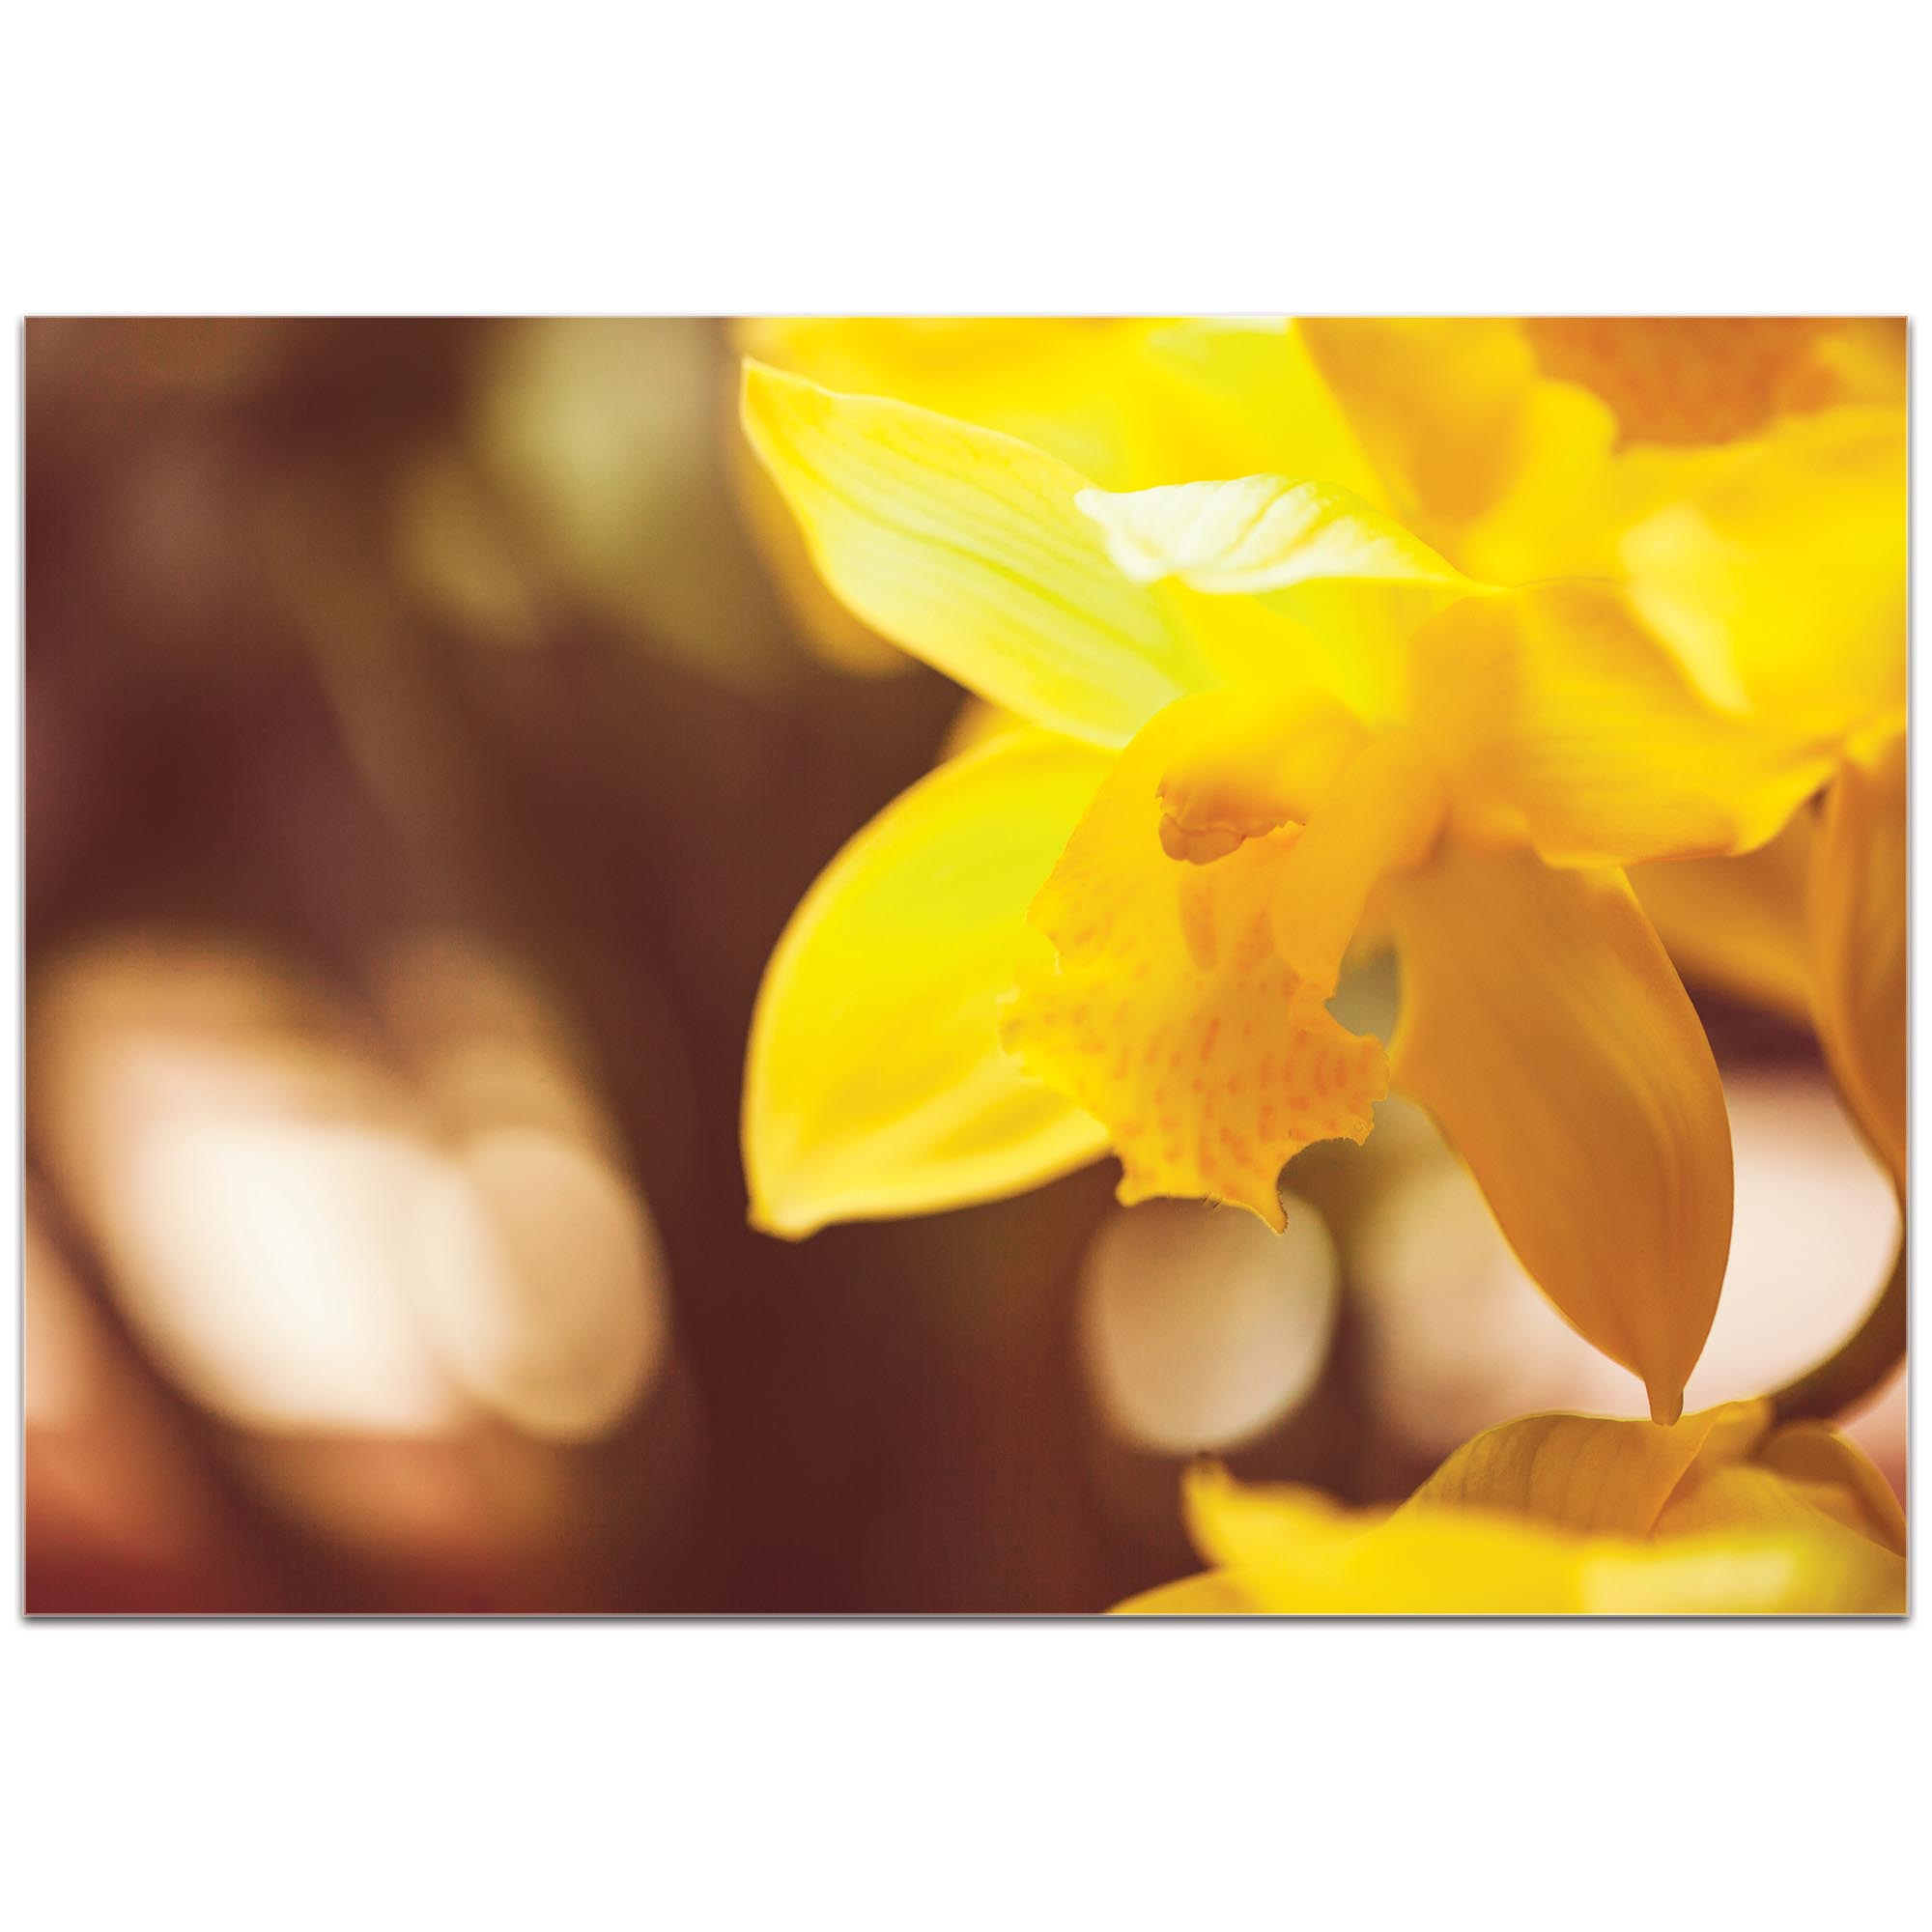 Nature Photography 'Golden Bloom' - Flower Blossom Art on Metal or Plexiglass - Image 2